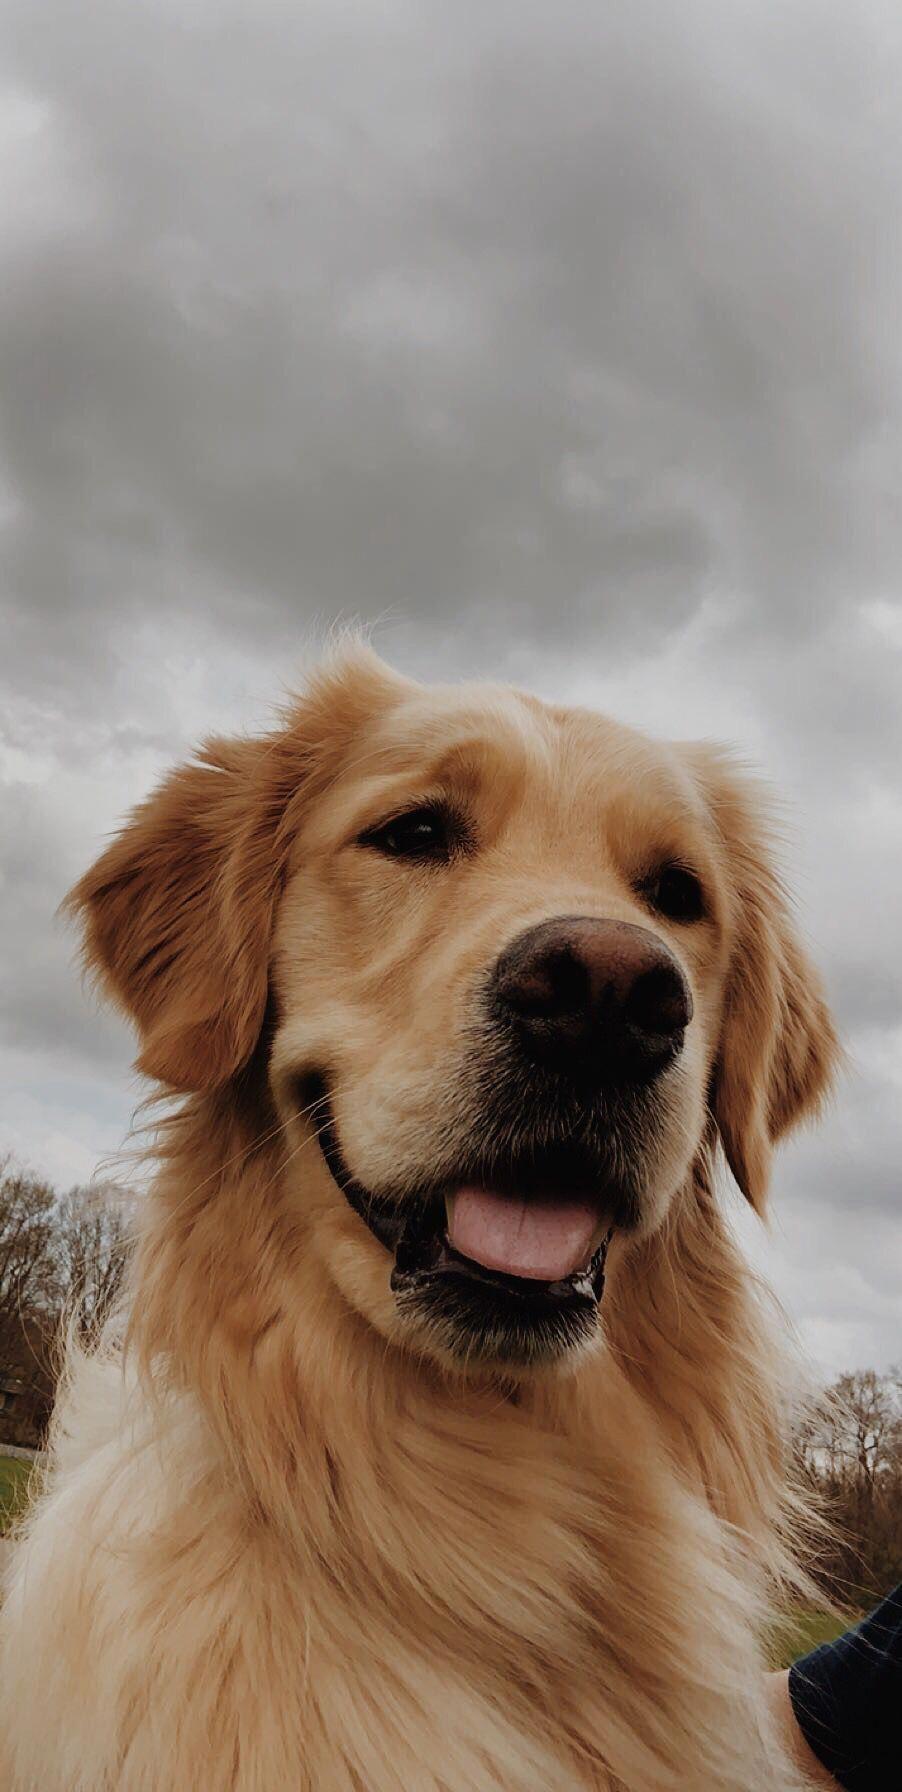 Golden Retriever Noble Loyal Companions Cute Dog Wallpaper